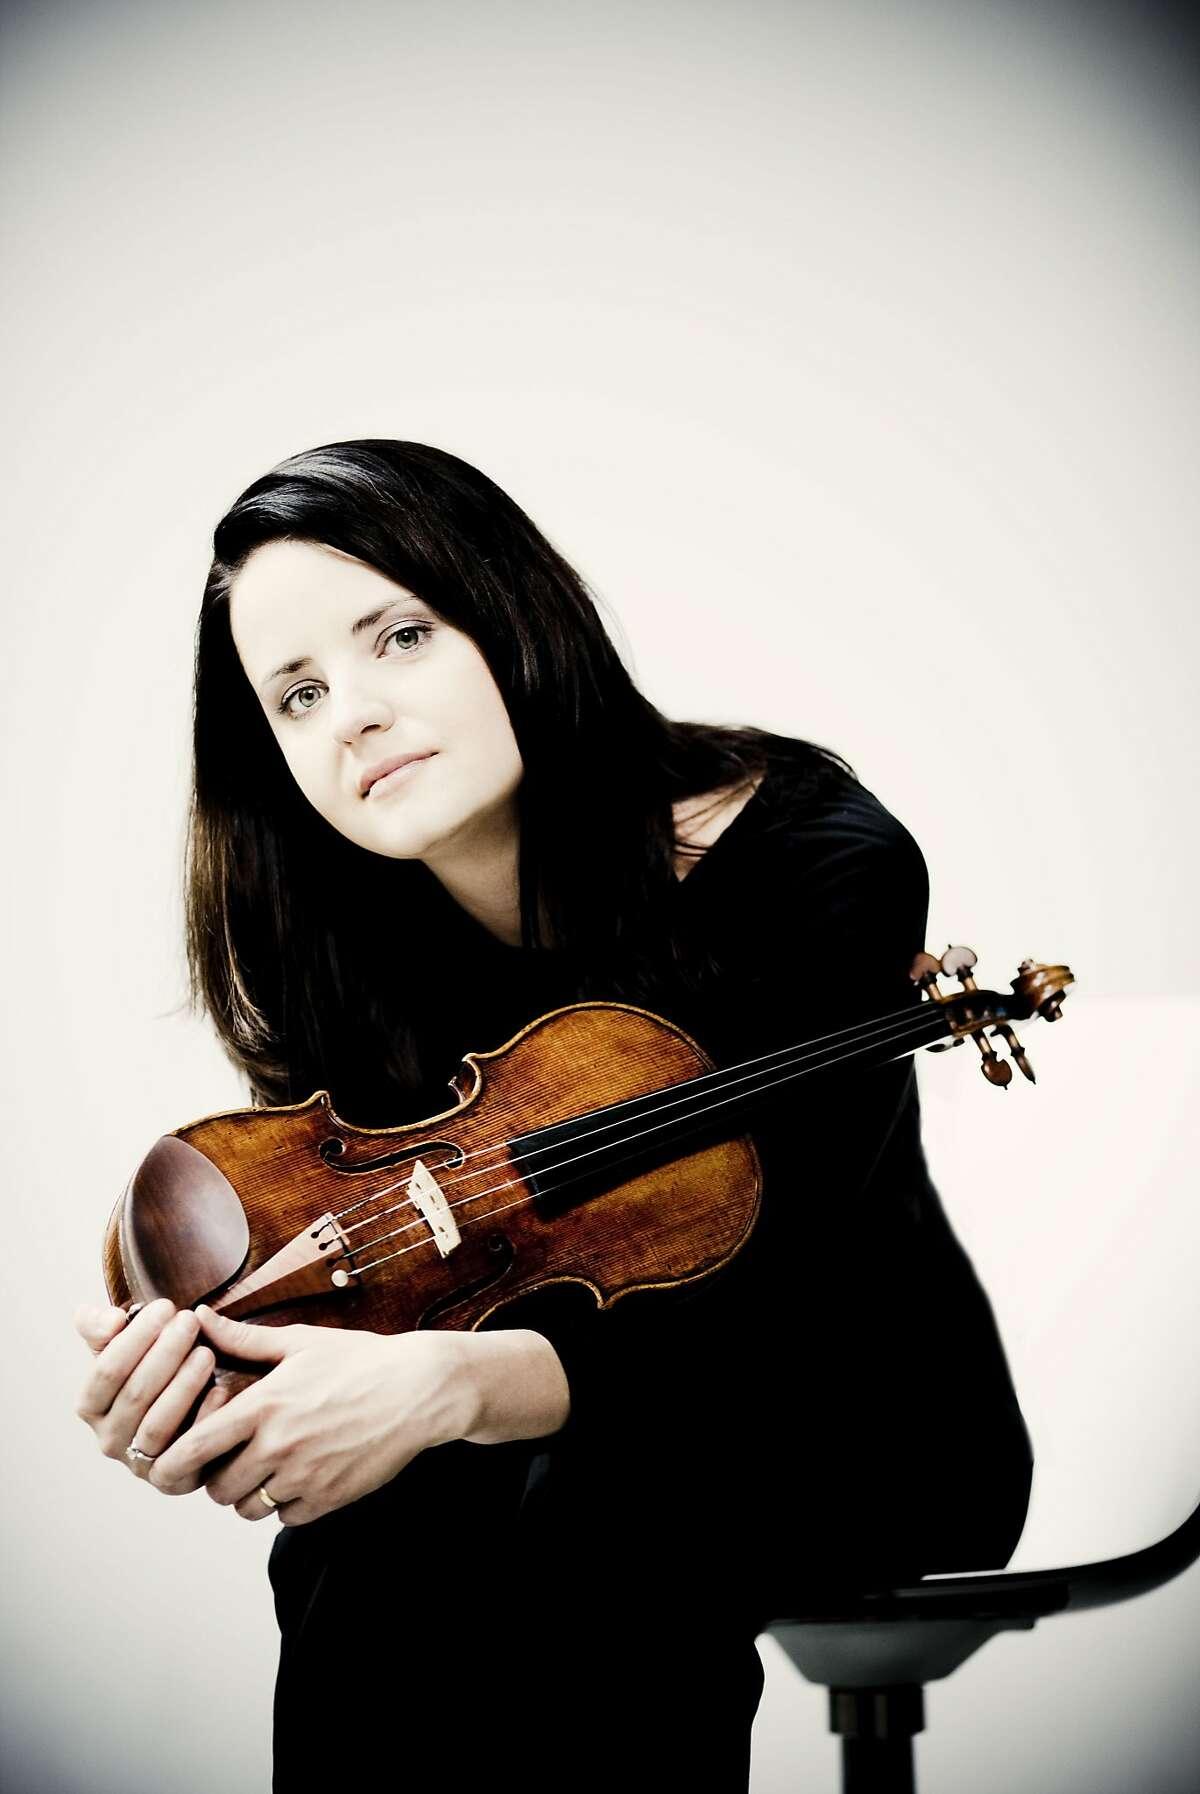 Violinist Baiba Skride performs with the San Francisco Symphony Thursday-Saturday